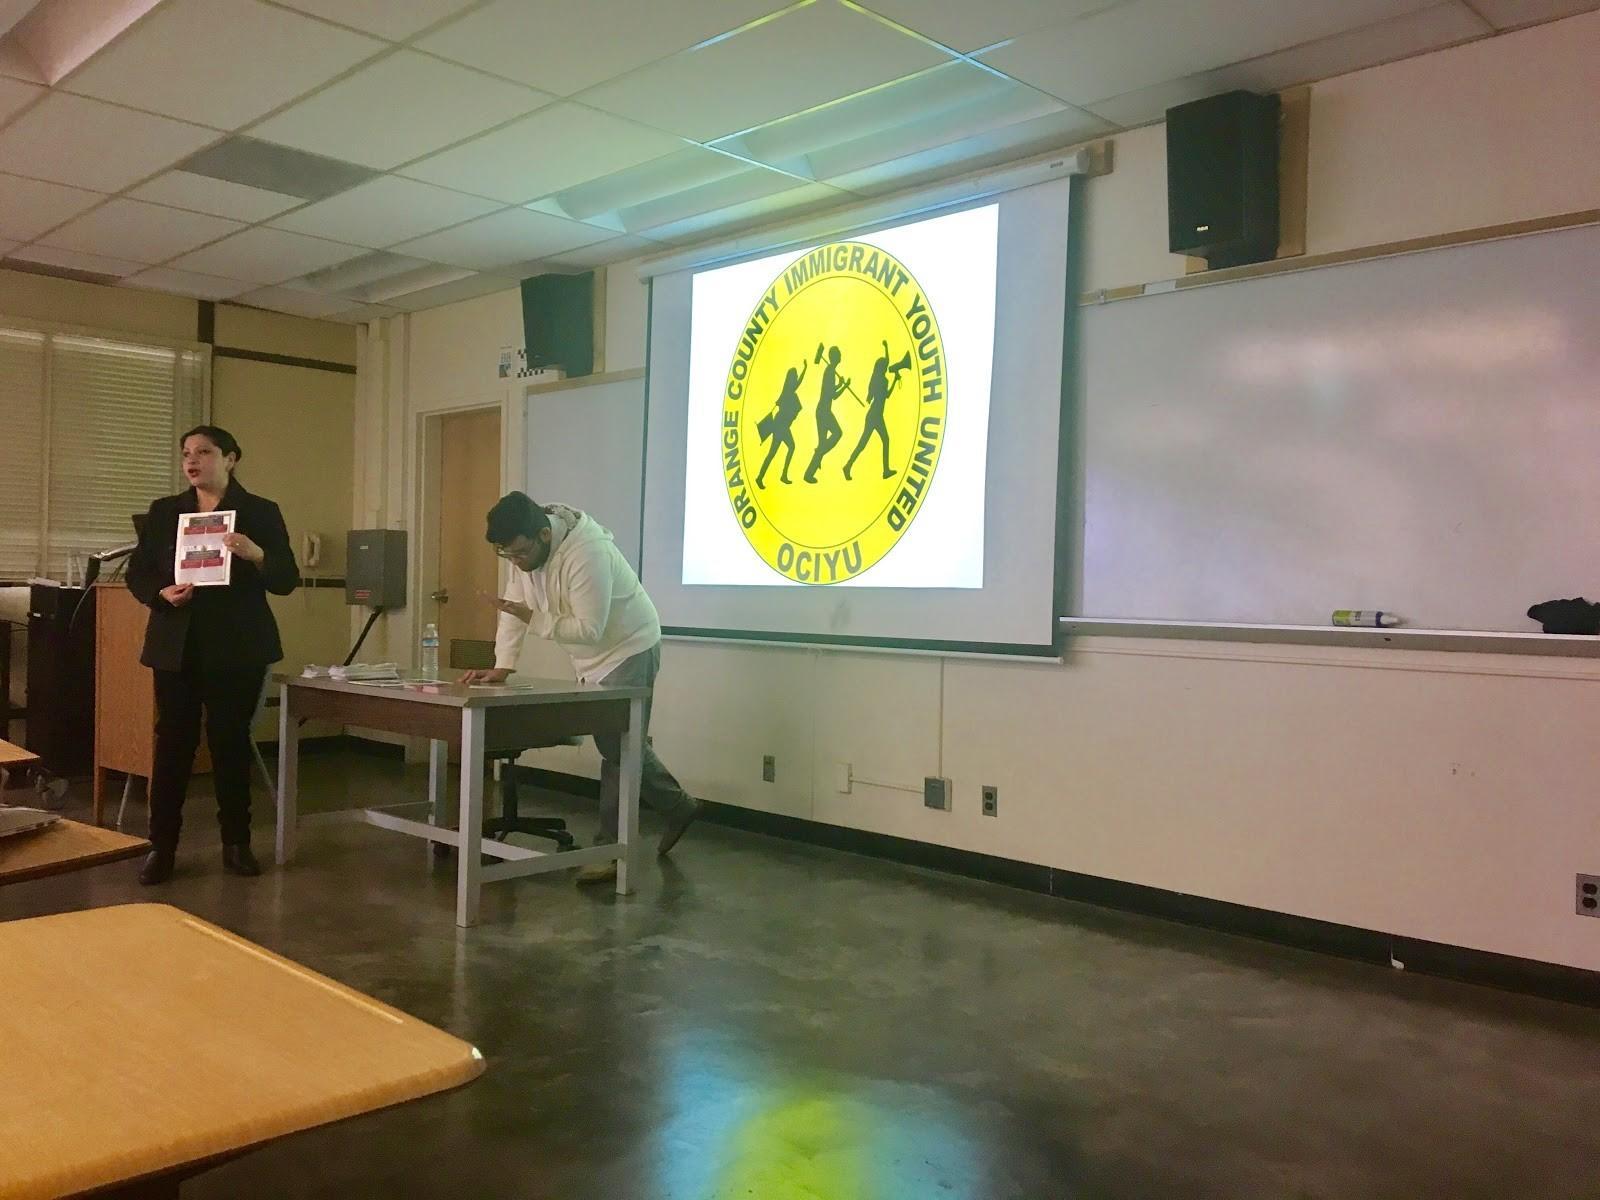 Know your rights workshop with Elizabeth Alaniz and Aldo Photo credit: Allison Clark